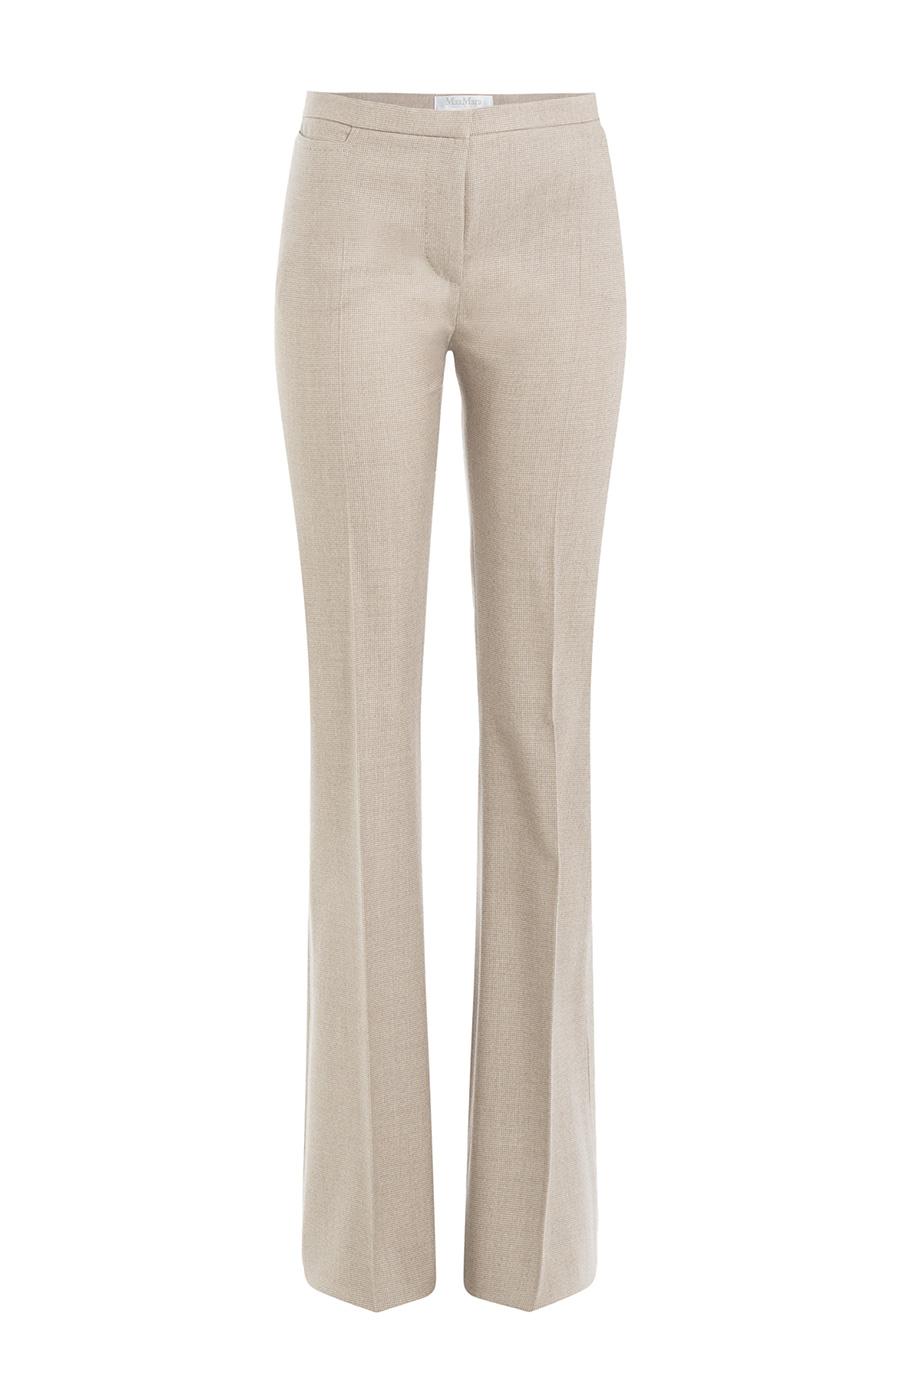 Max Mara Wool & Silk Canvas Pants, Beige